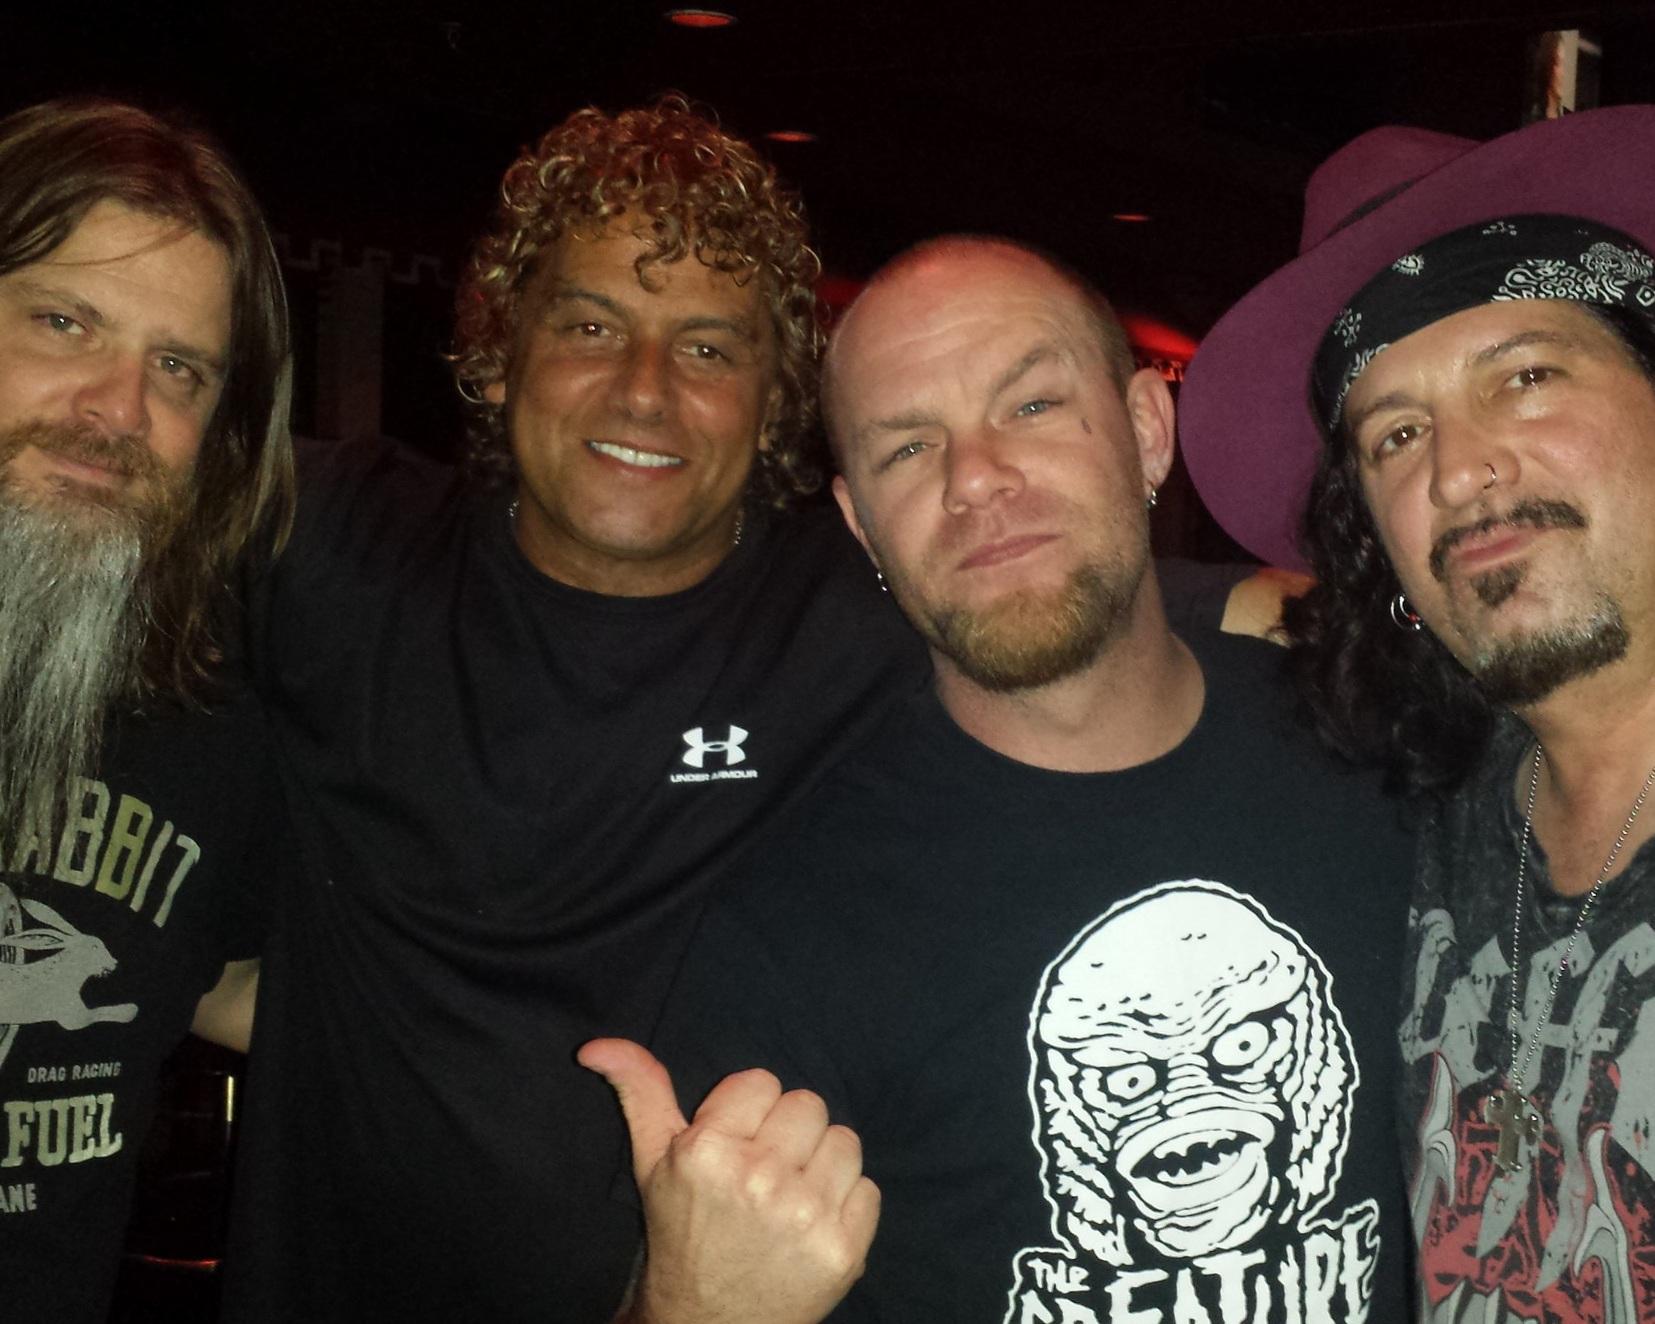 Kevin Churko, Steve Thompson, Ivan 5 Finger Death Punch and Ron M in Las Vegas